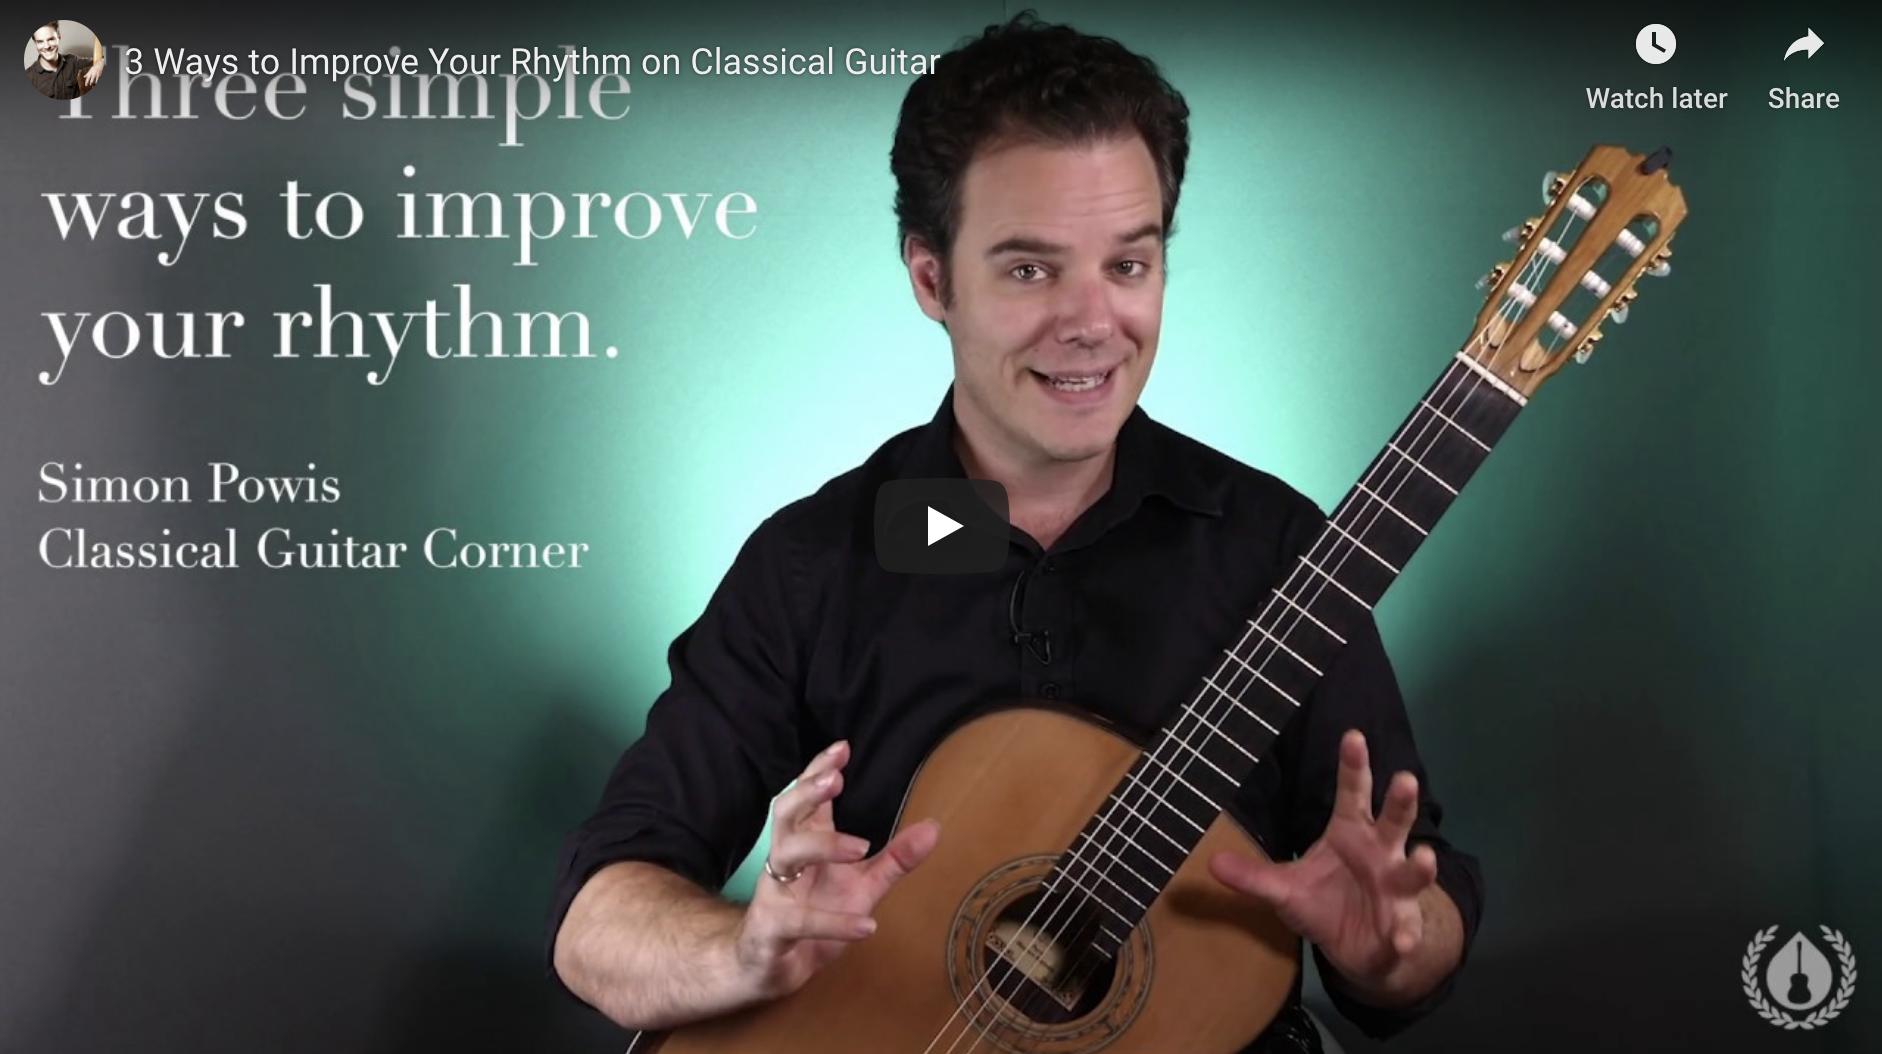 3 Ways to improve your rhythm